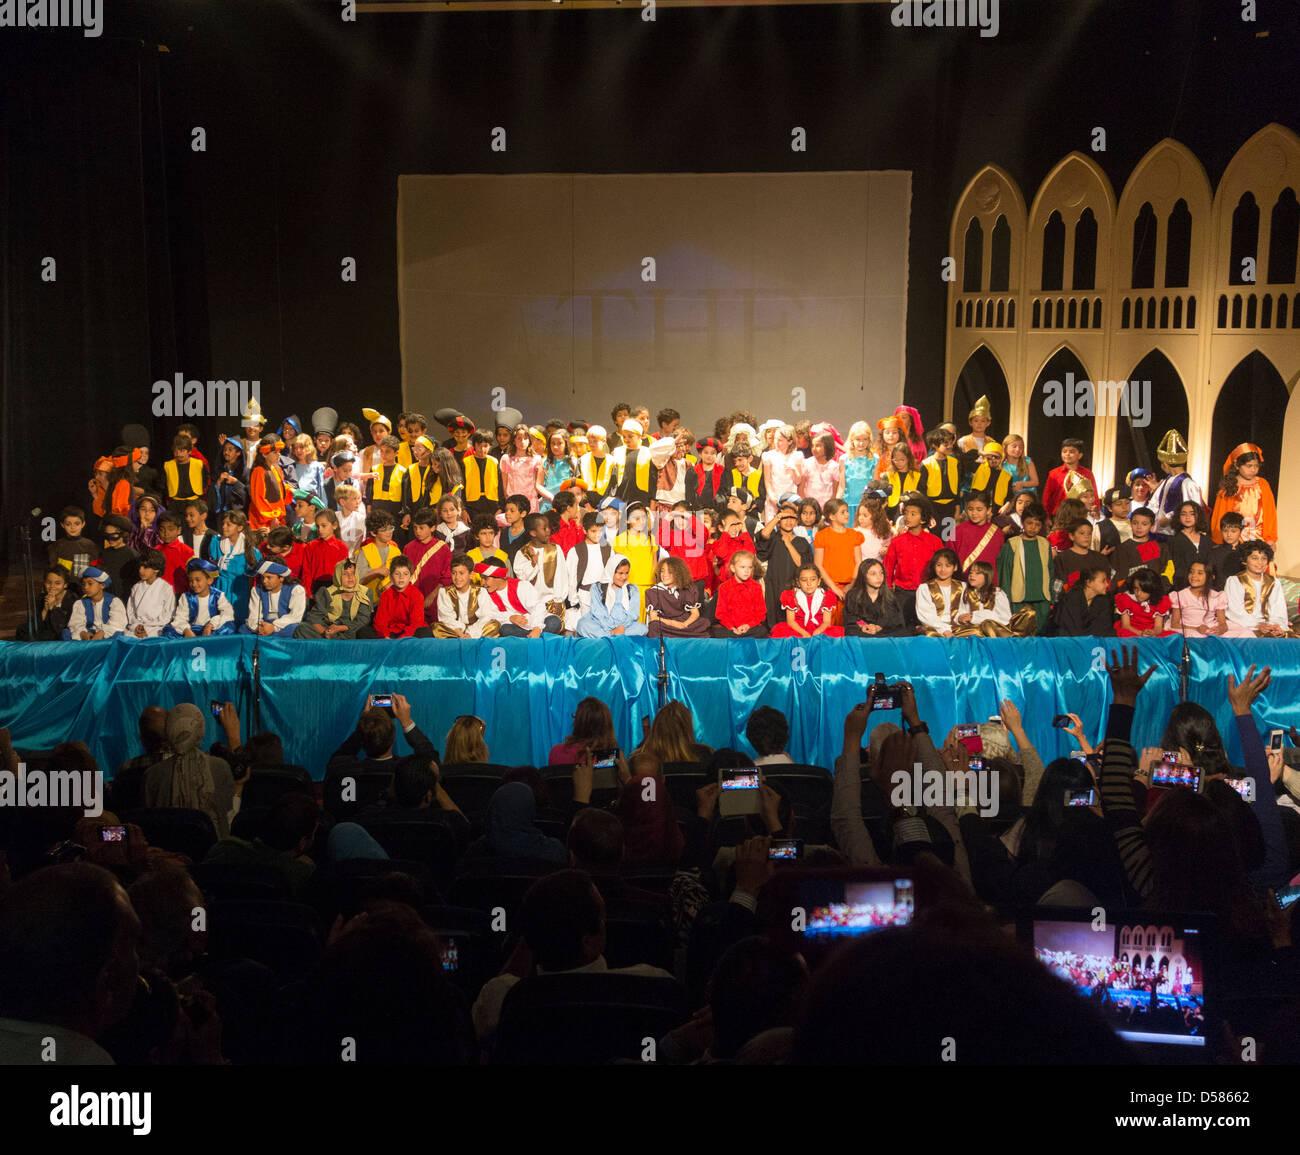 Curtain Call Performance Of The Arabian Nights At Theatre British International School Cairo Egpyt BISC